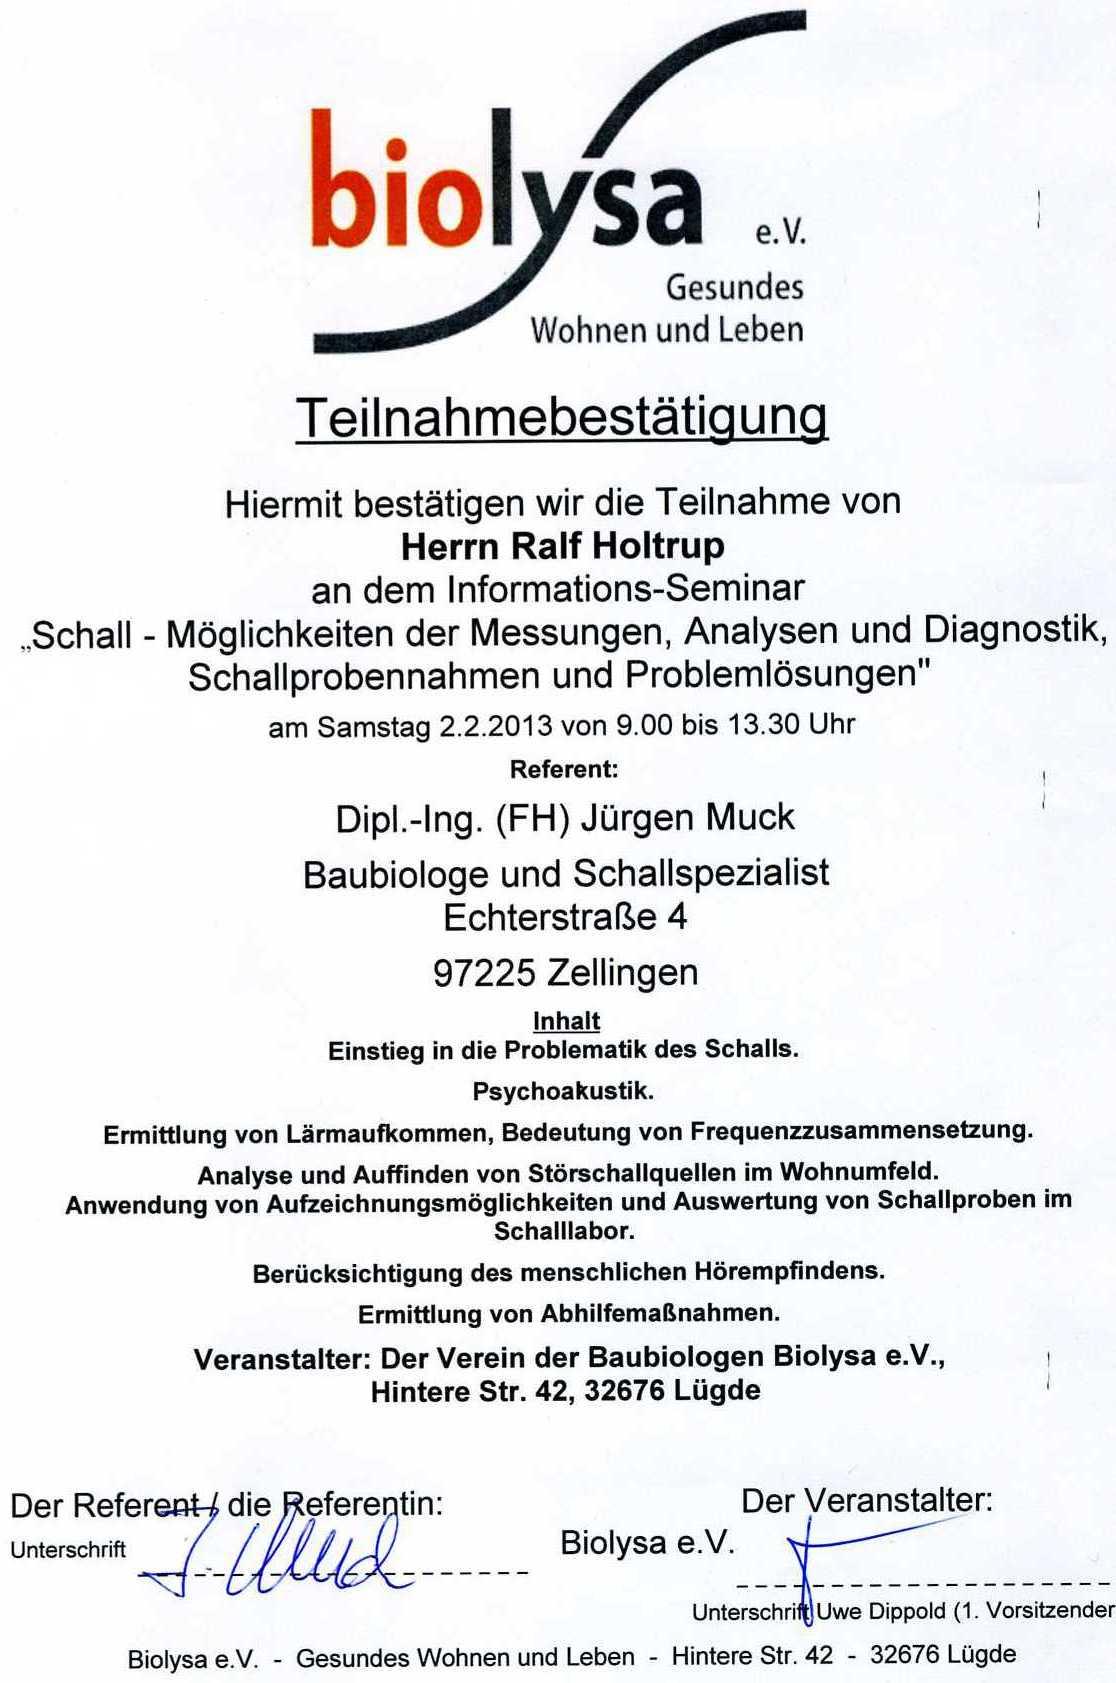 Charmant Zertifikat Der Teilnahme Vorlage Fotos - Entry Level Resume ...